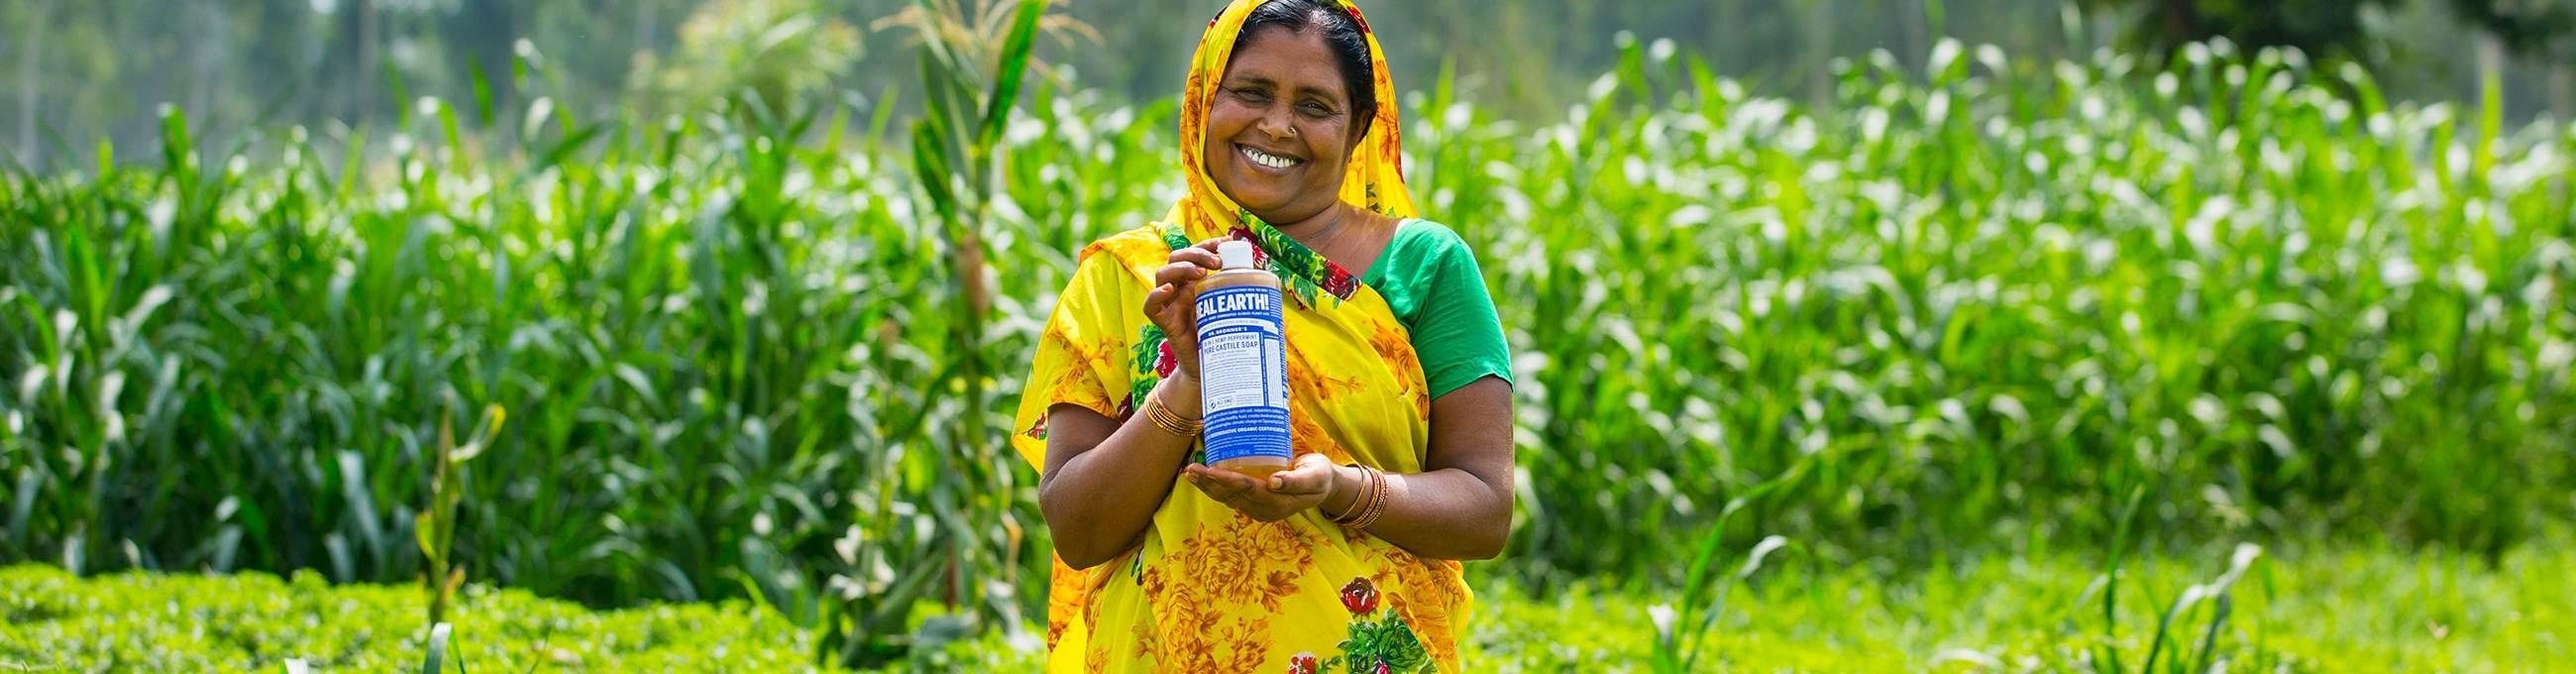 Dr Bronner's Magic Soaps Blog for World Fair Trade Day 2019 - Fair Trade Innovates